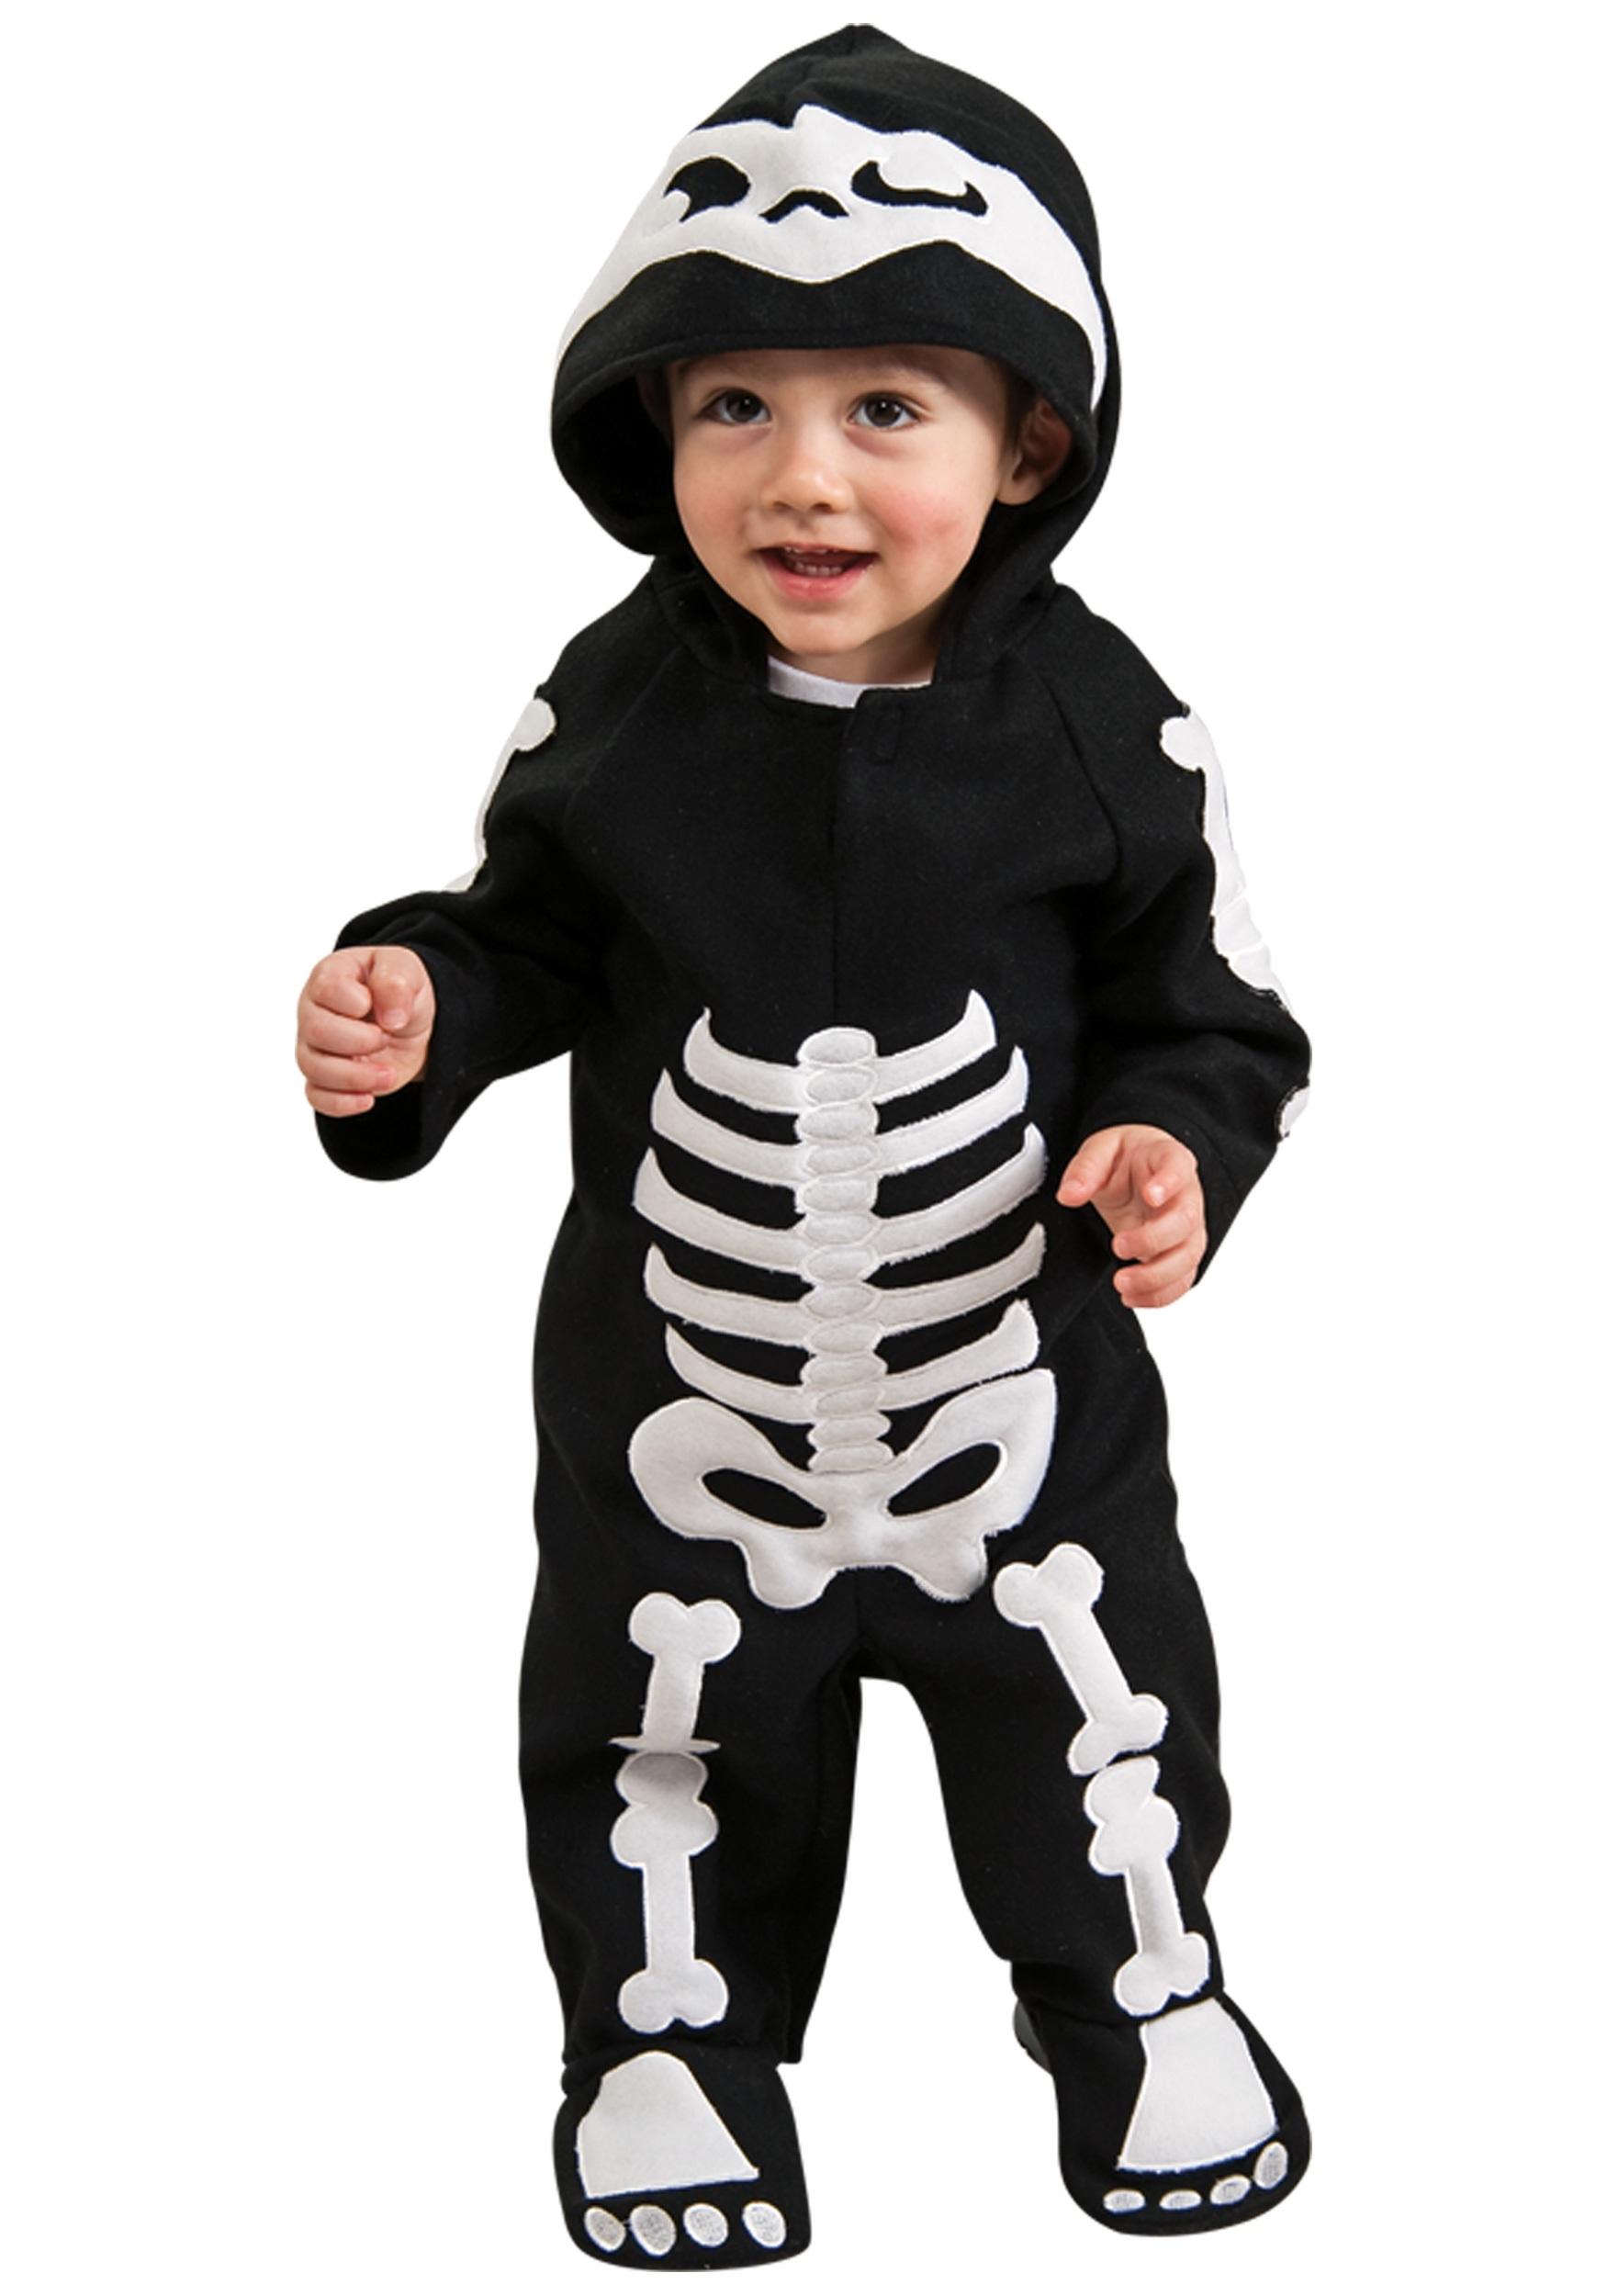 Baby / Toddler Lil Bones Costume  sc 1 st  Halloween Costume & Baby Costumes - Unique Baby Halloween Costumes